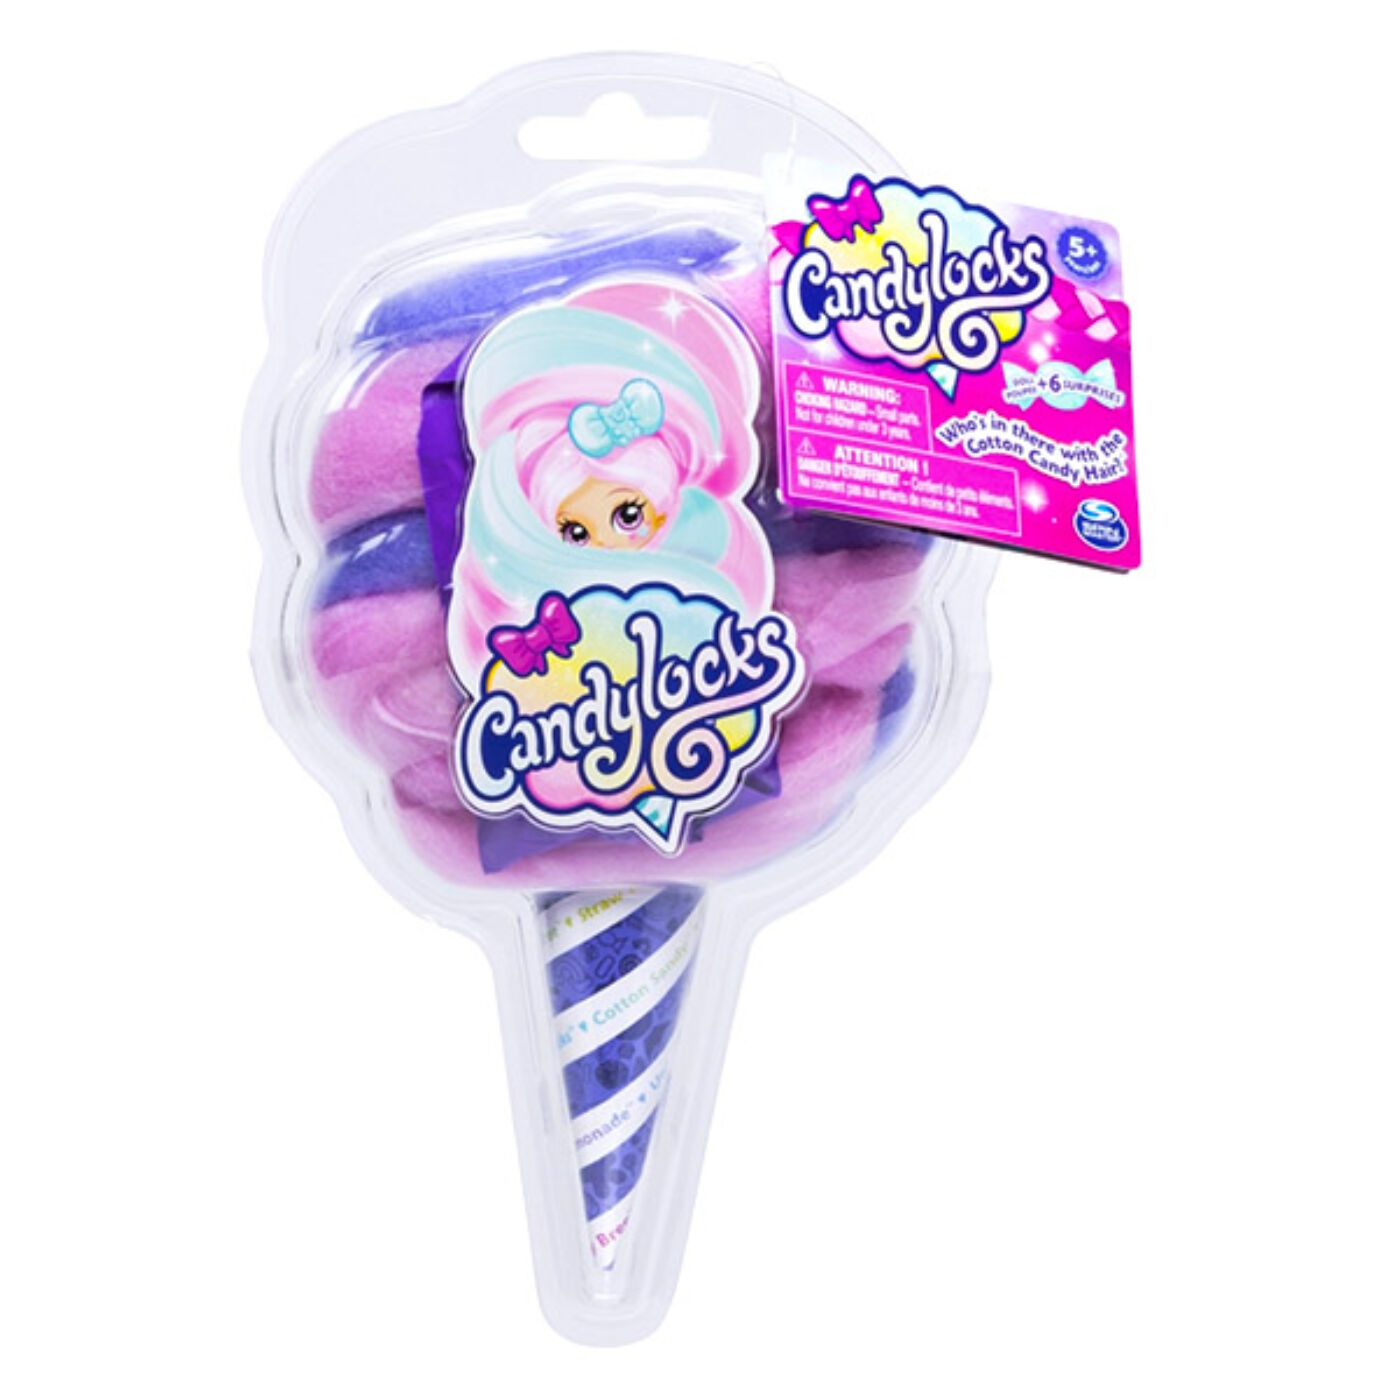 Candylocks-Vattacukor baba